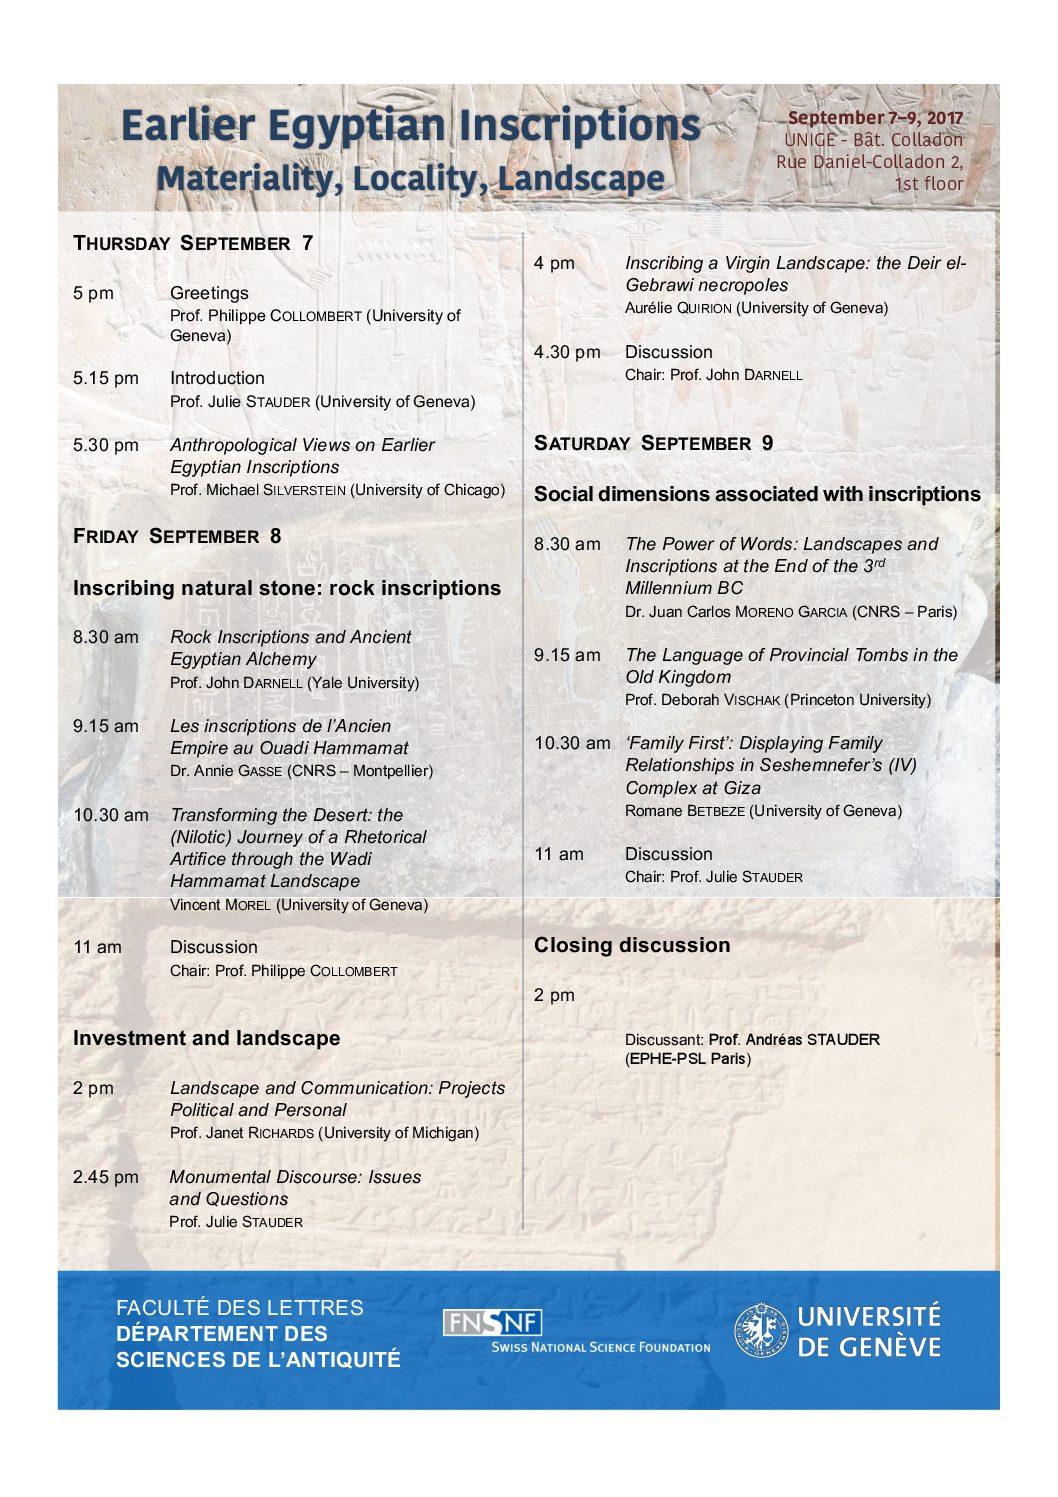 International Workshop – 'Earlier Egyptian Inscriptions: Materiality, Locality, Landscape'